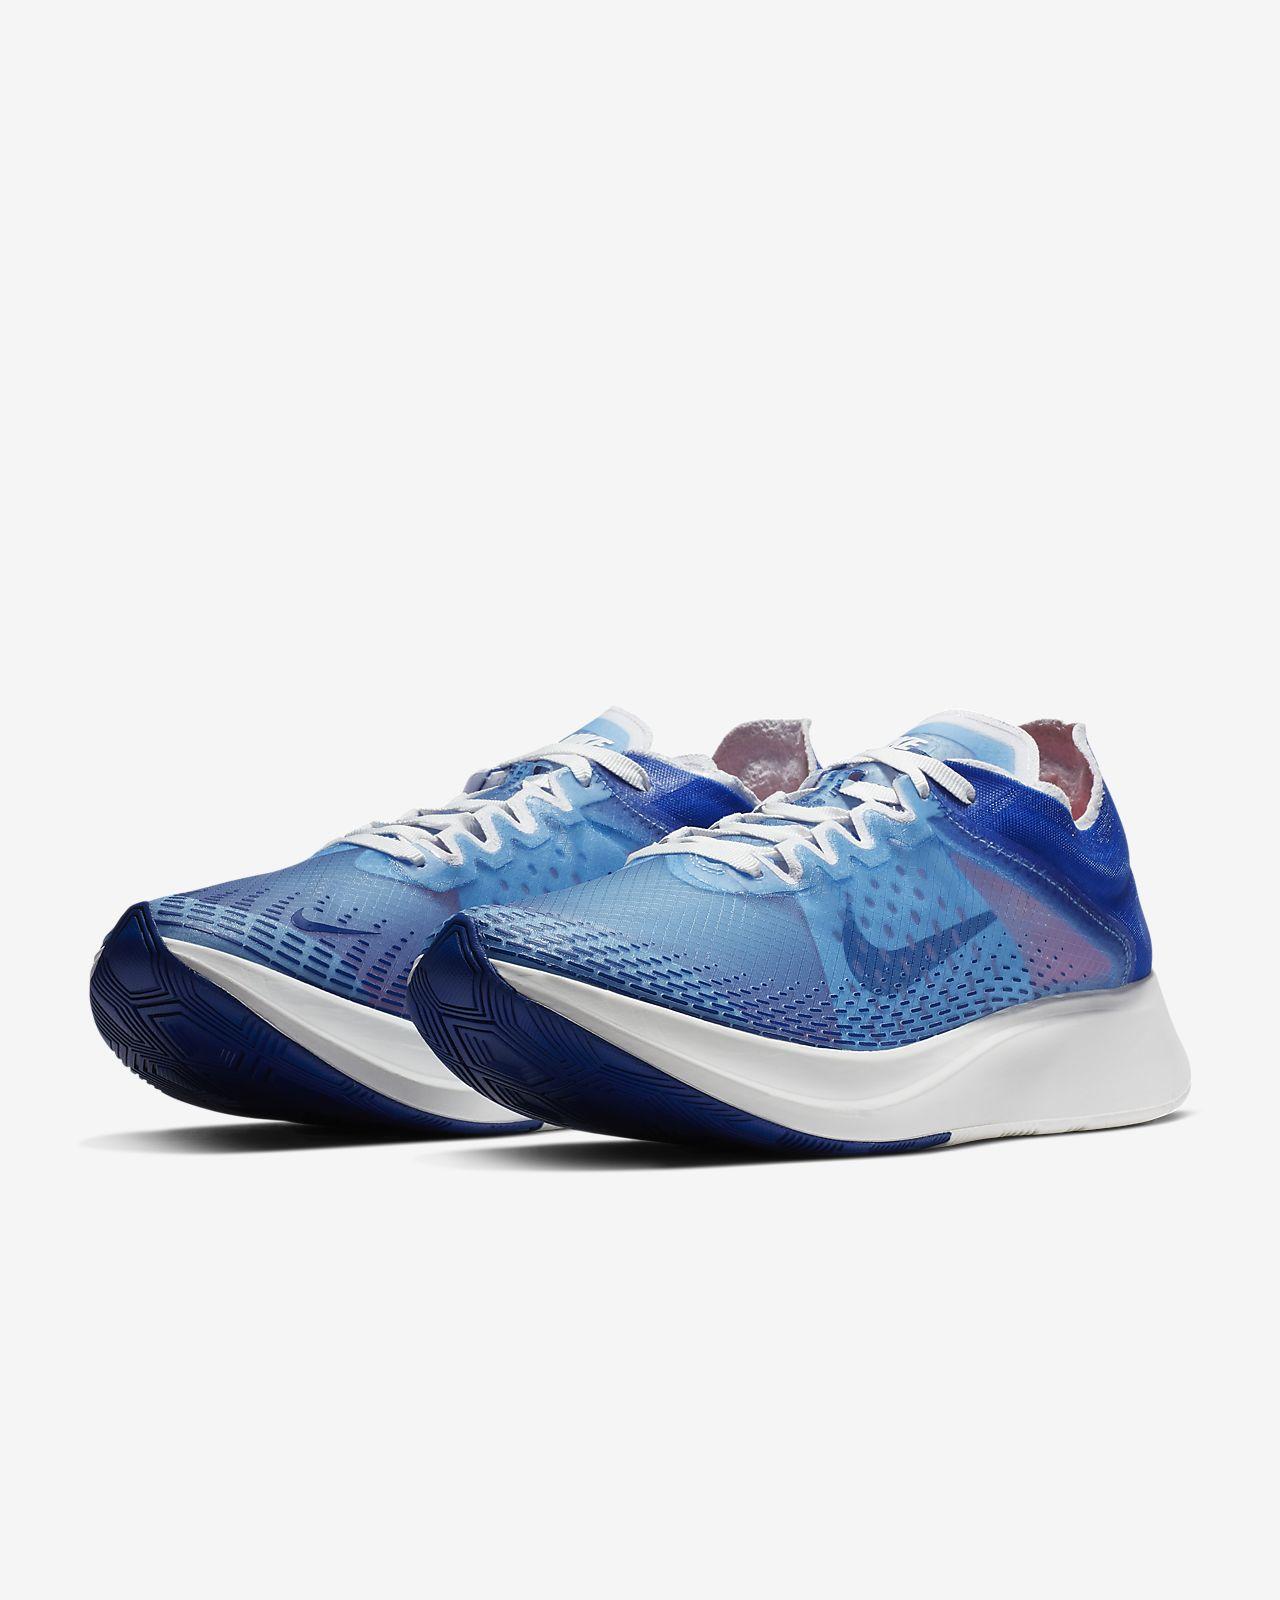 c85544810dc4 Nike Zoom Fly SP Fast Women s Running Shoe. Nike.com